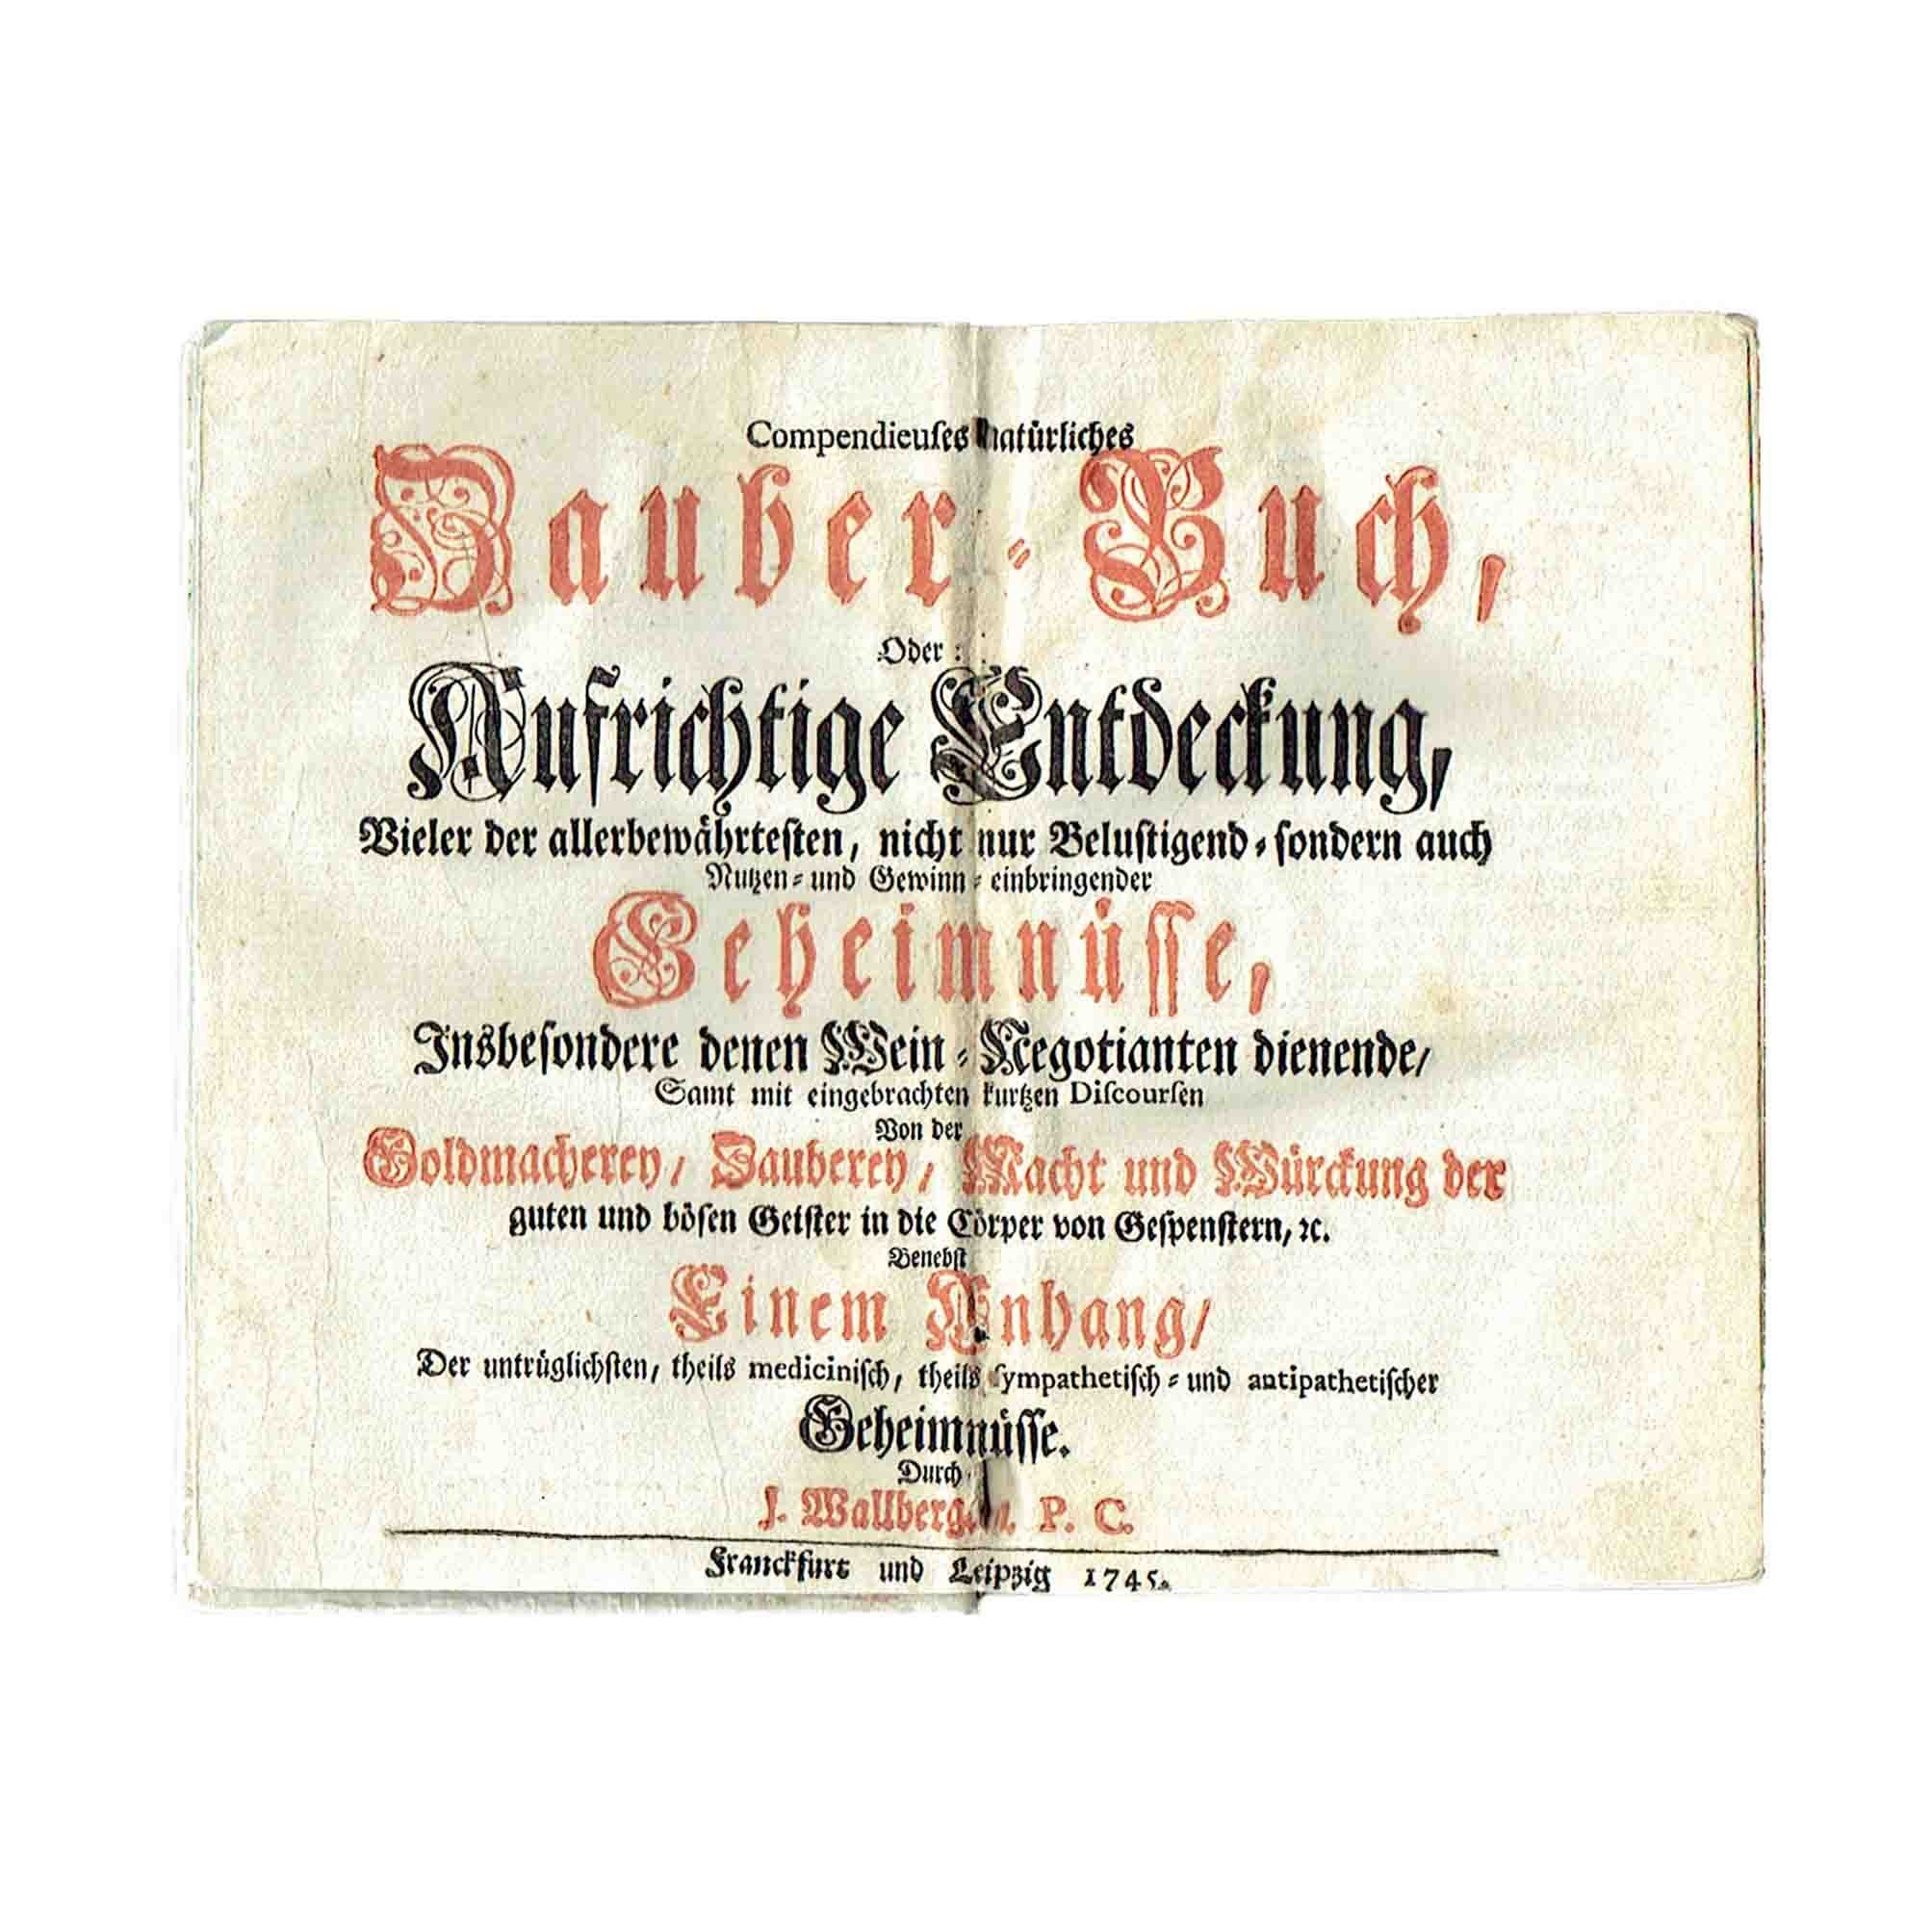 5958 Wallberg Zauber-Buch 1745 Title A N